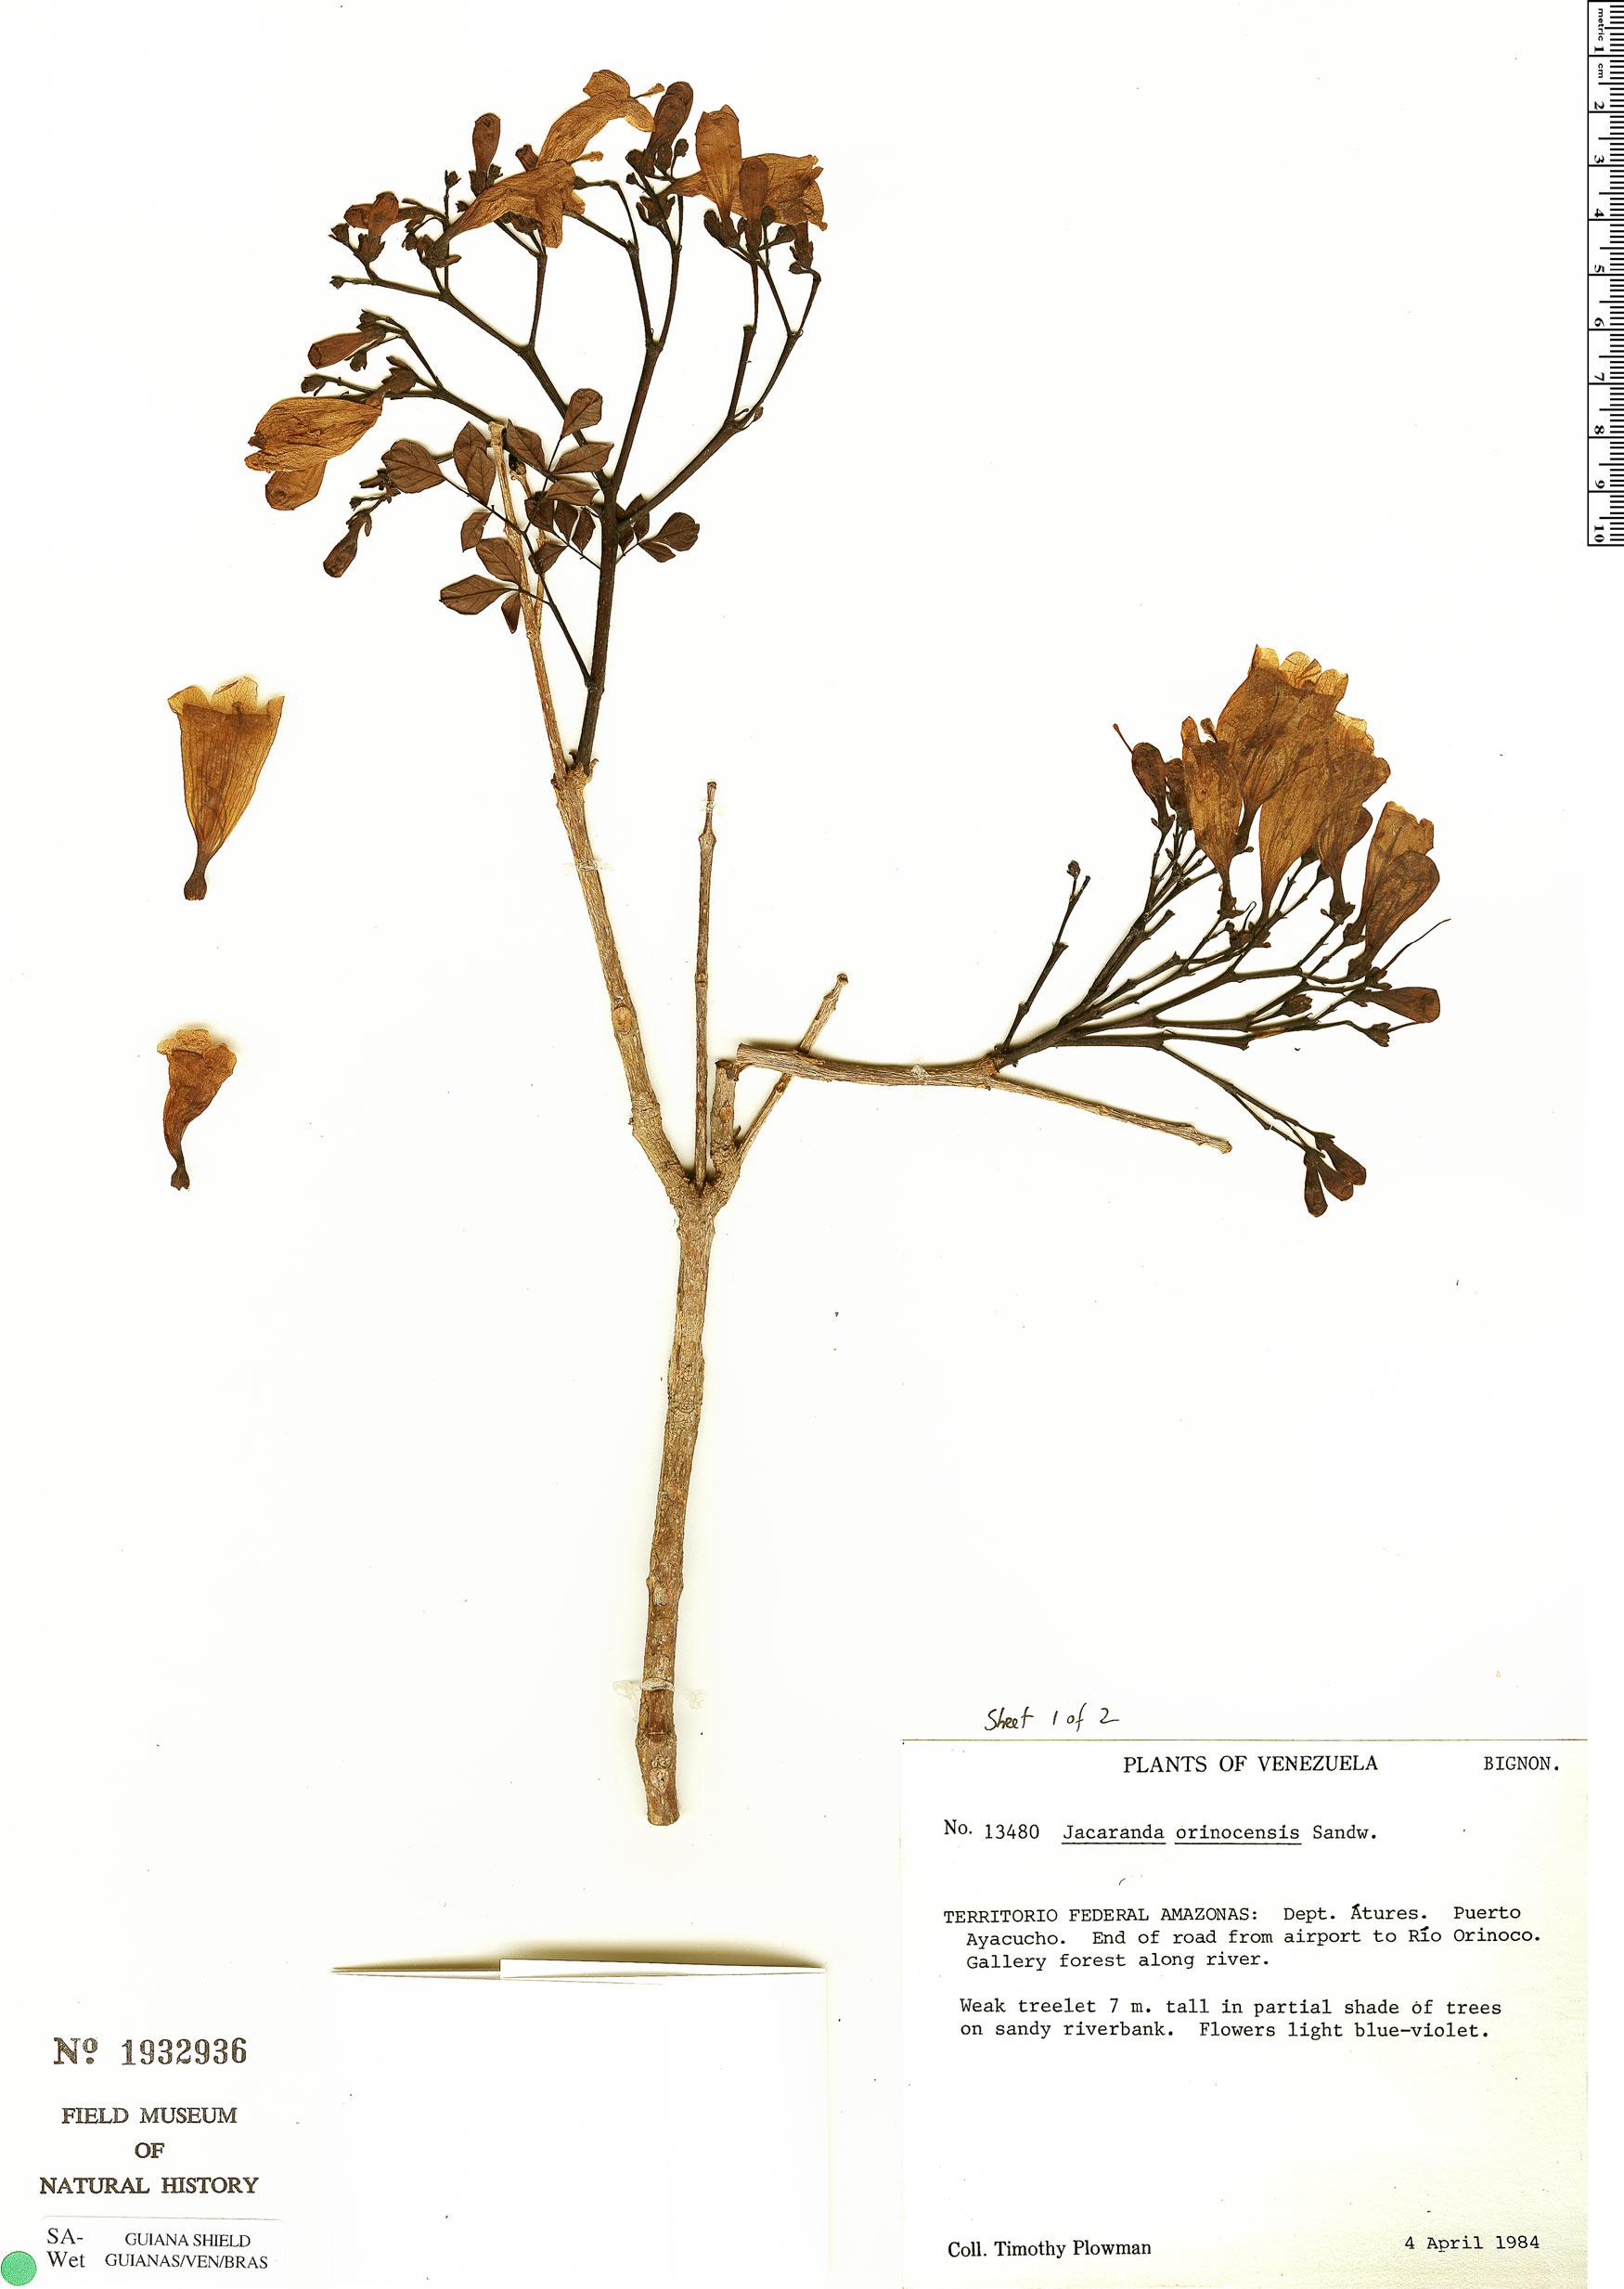 Specimen: Jacaranda orinocensis